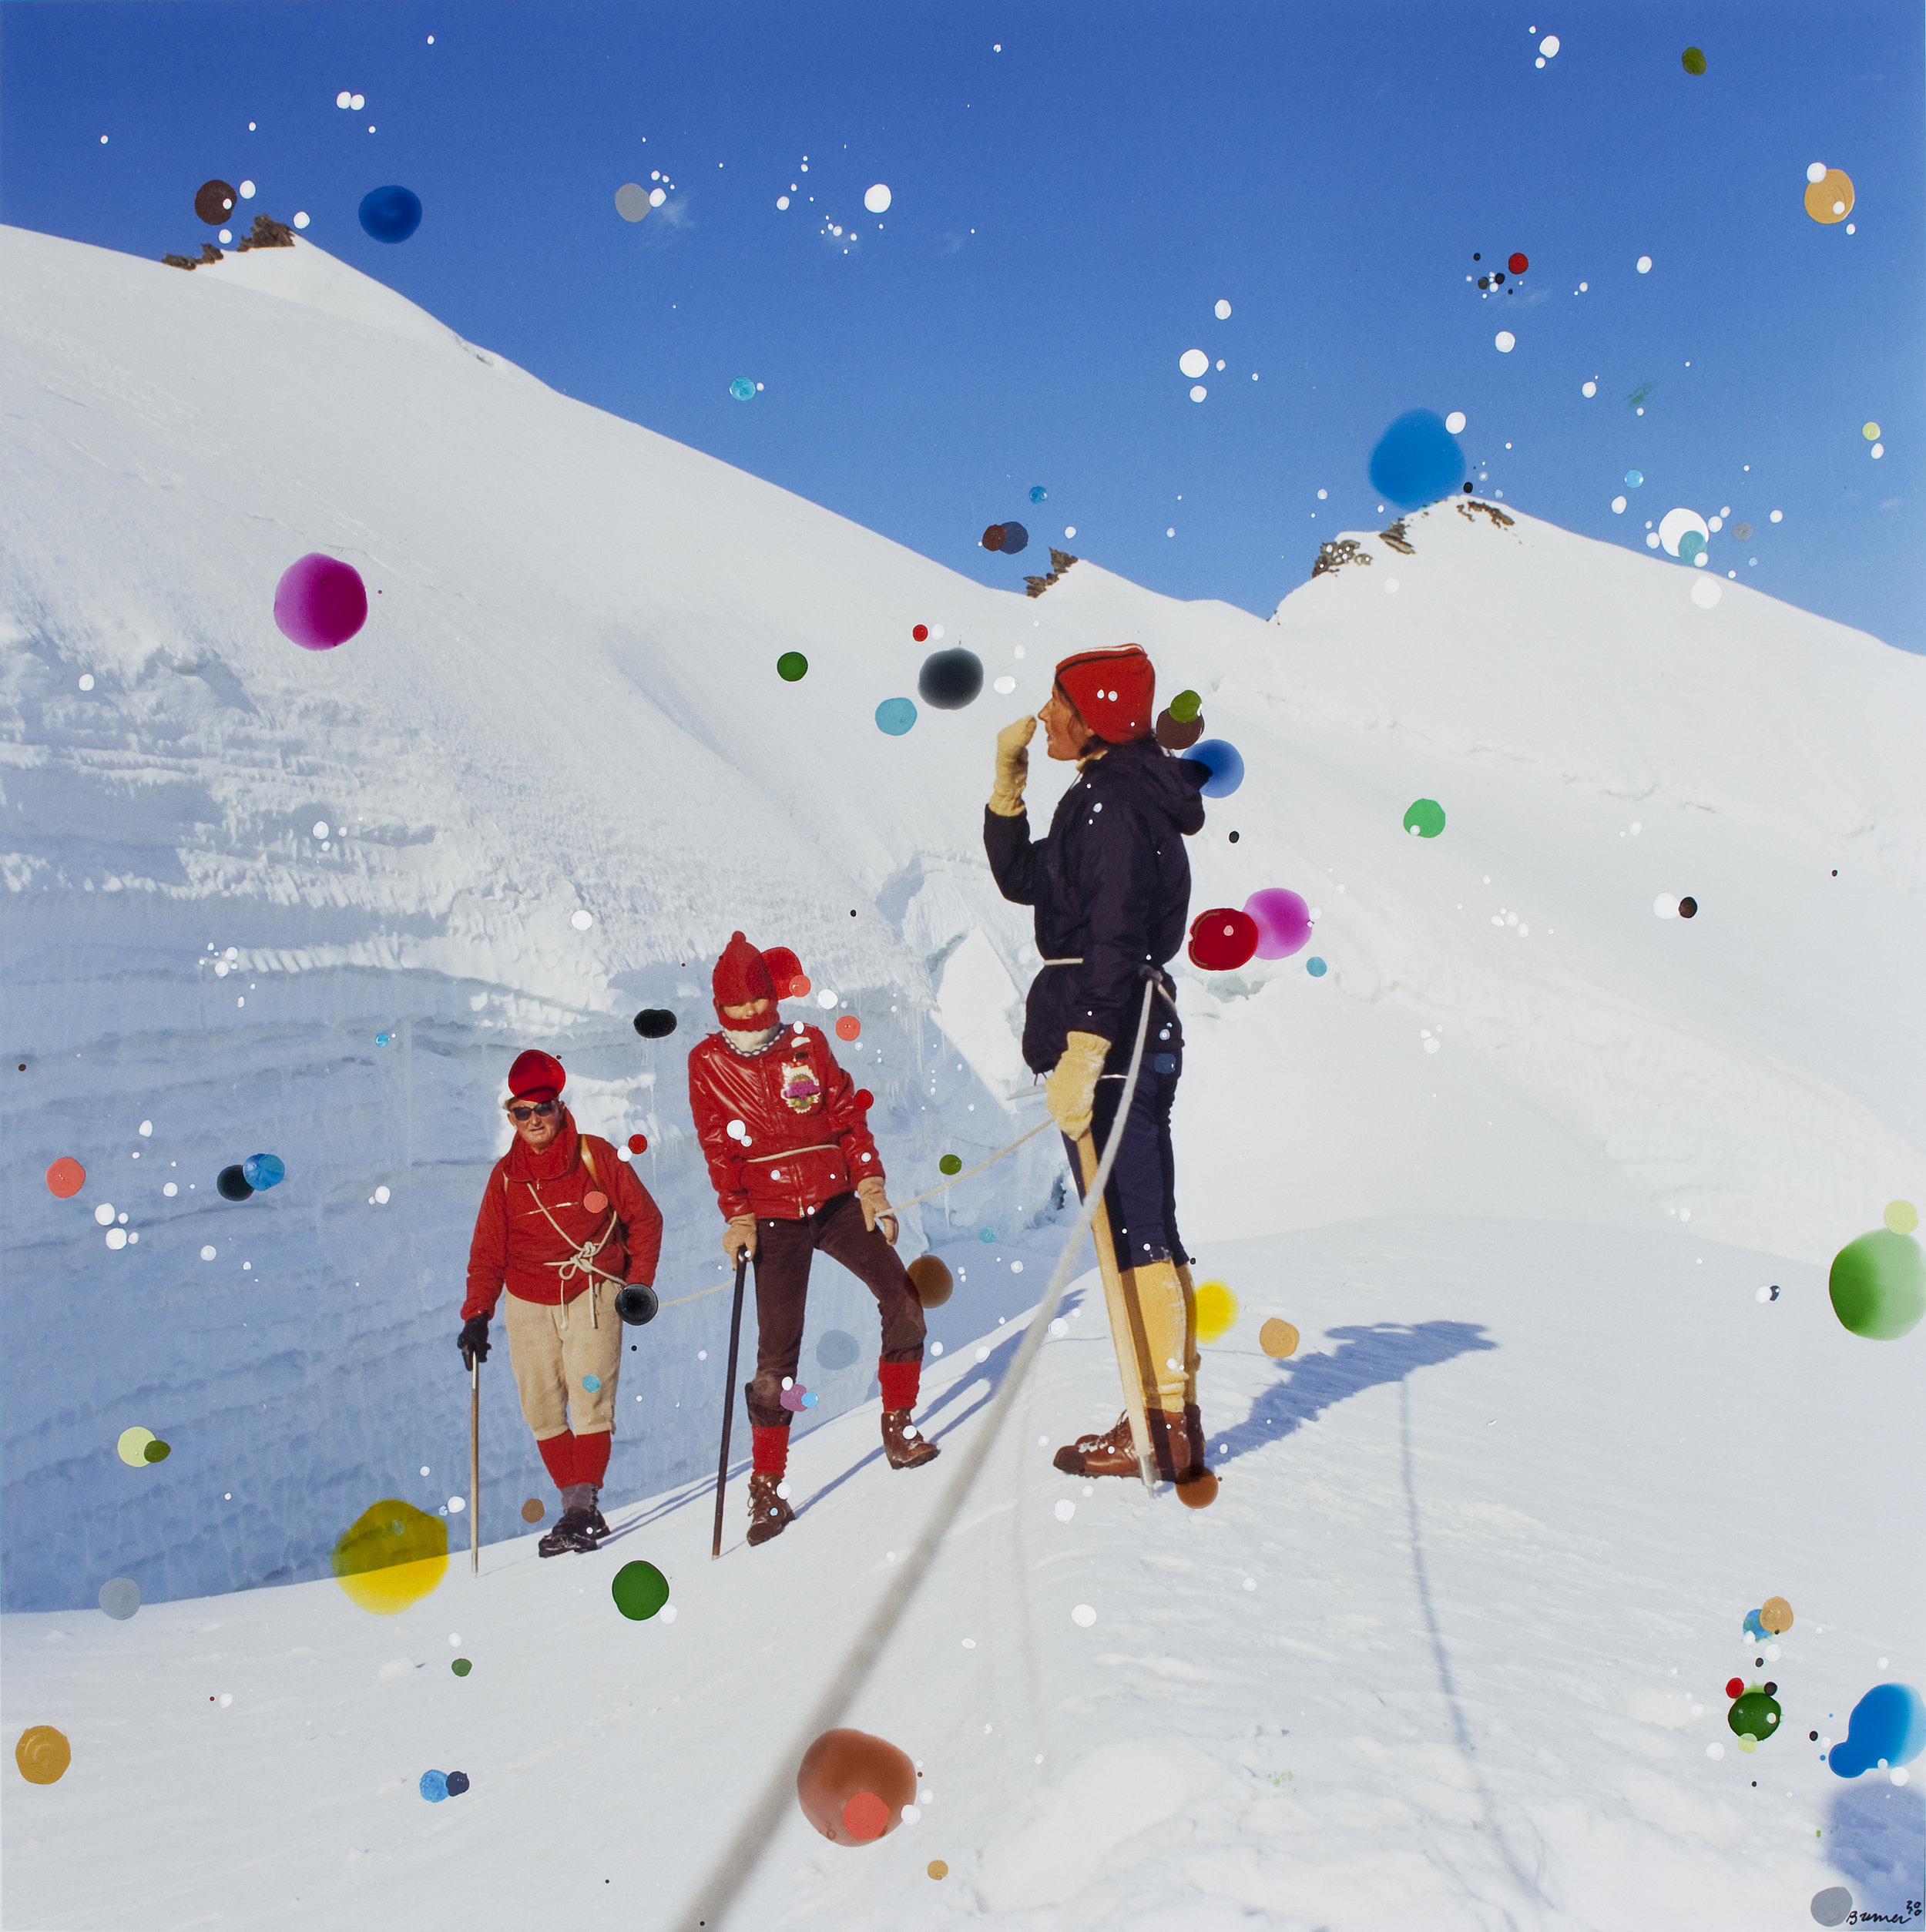 Schoener Goetterfunken XV, To virtue's steep hill (Zu der Tugend steilem Huegel)